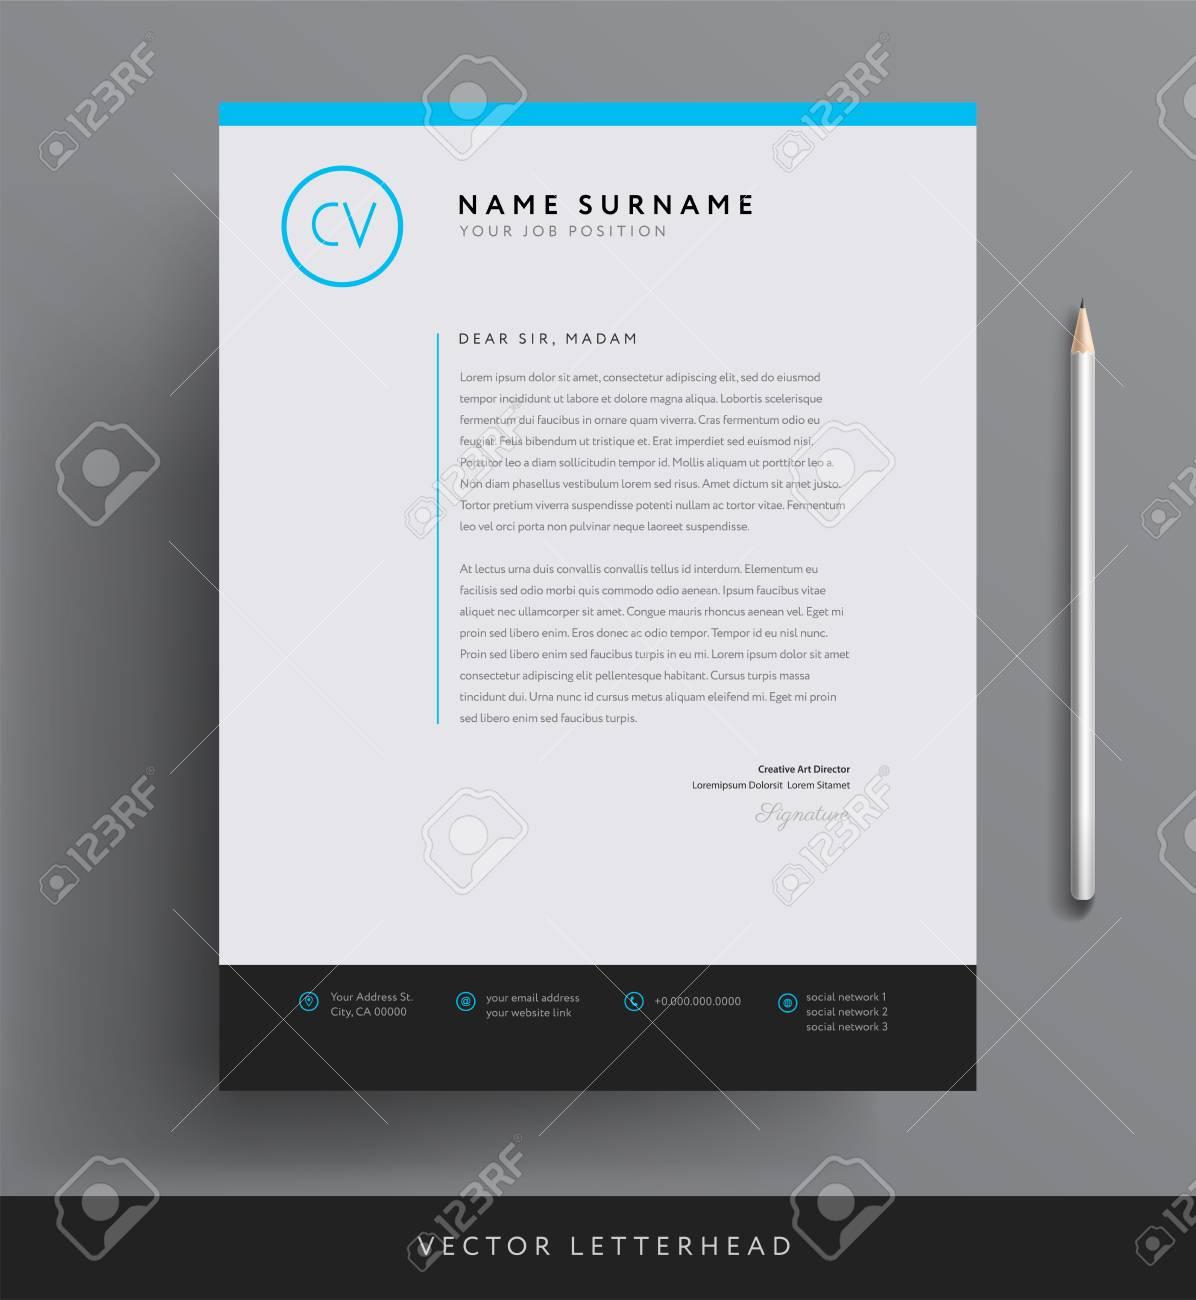 Elegant Letterhead Template Design In Minimalist Style Stock Vector